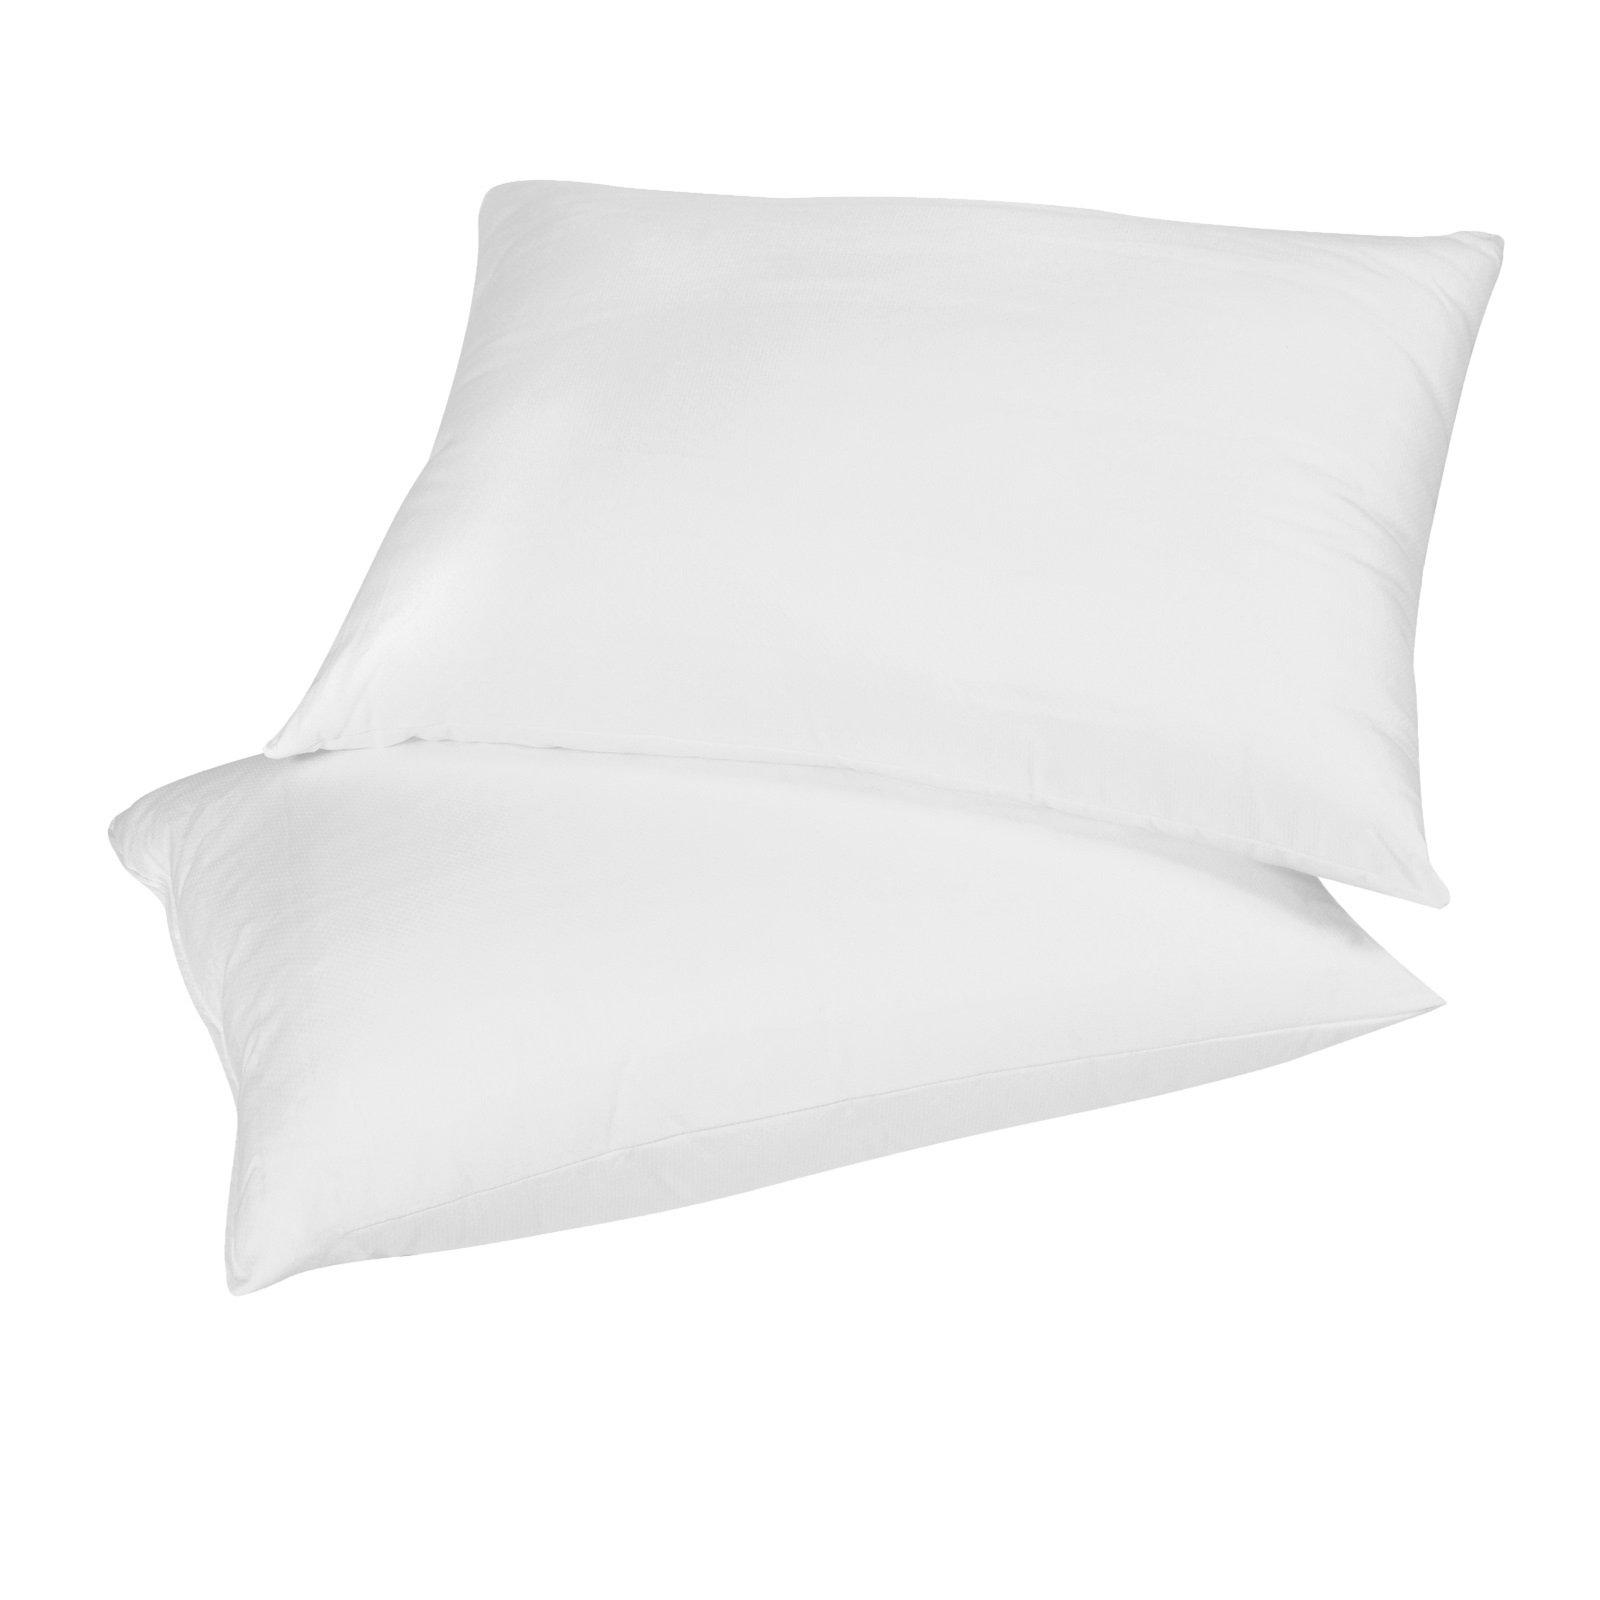 Empyrean Bedding Set Of 4 Premium King-Size Pillowcases Microfiber Linen, Hypoallergenic & Breathable Design, Soft & Comfortable Hotel Luxury – White